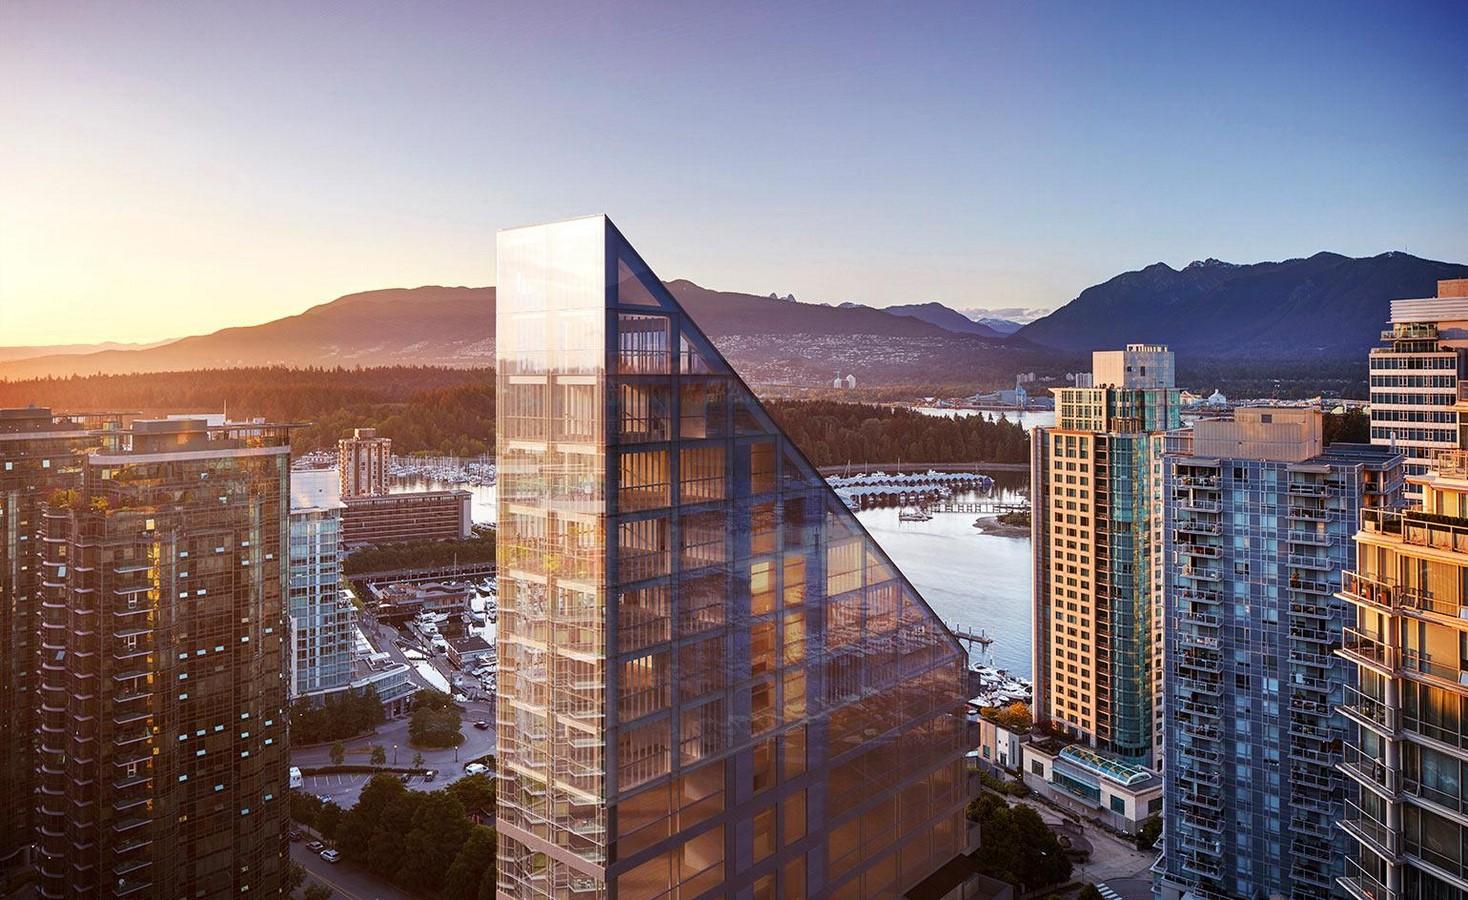 Terrace House by Shigeru Ban: The Tallest Hybrid Wood Tower - Sheet1